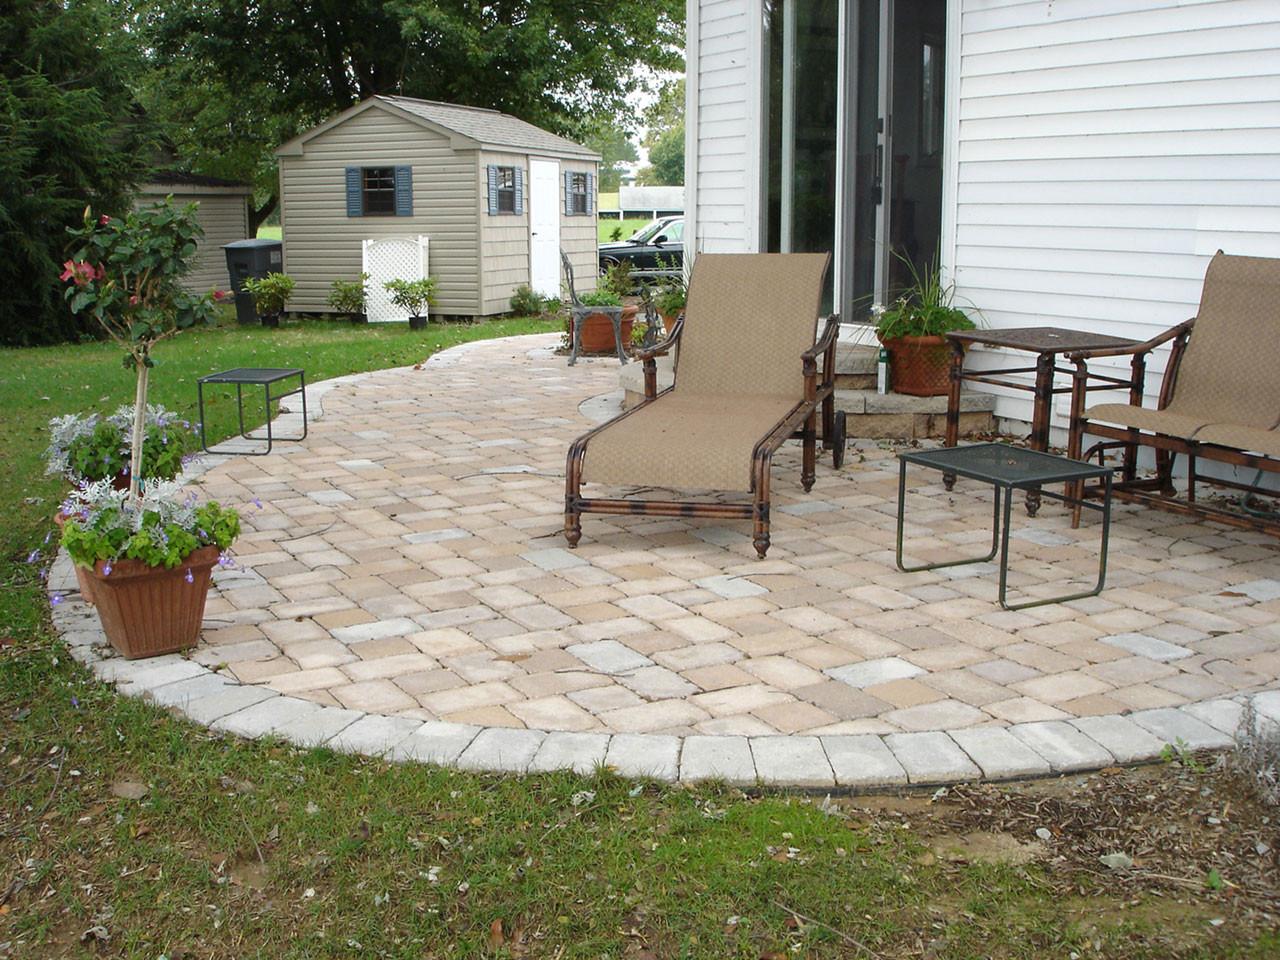 Backyard Patio Paver Design Ideas  Paver Patio Ideas for Enchanting Backyard Amaza Design